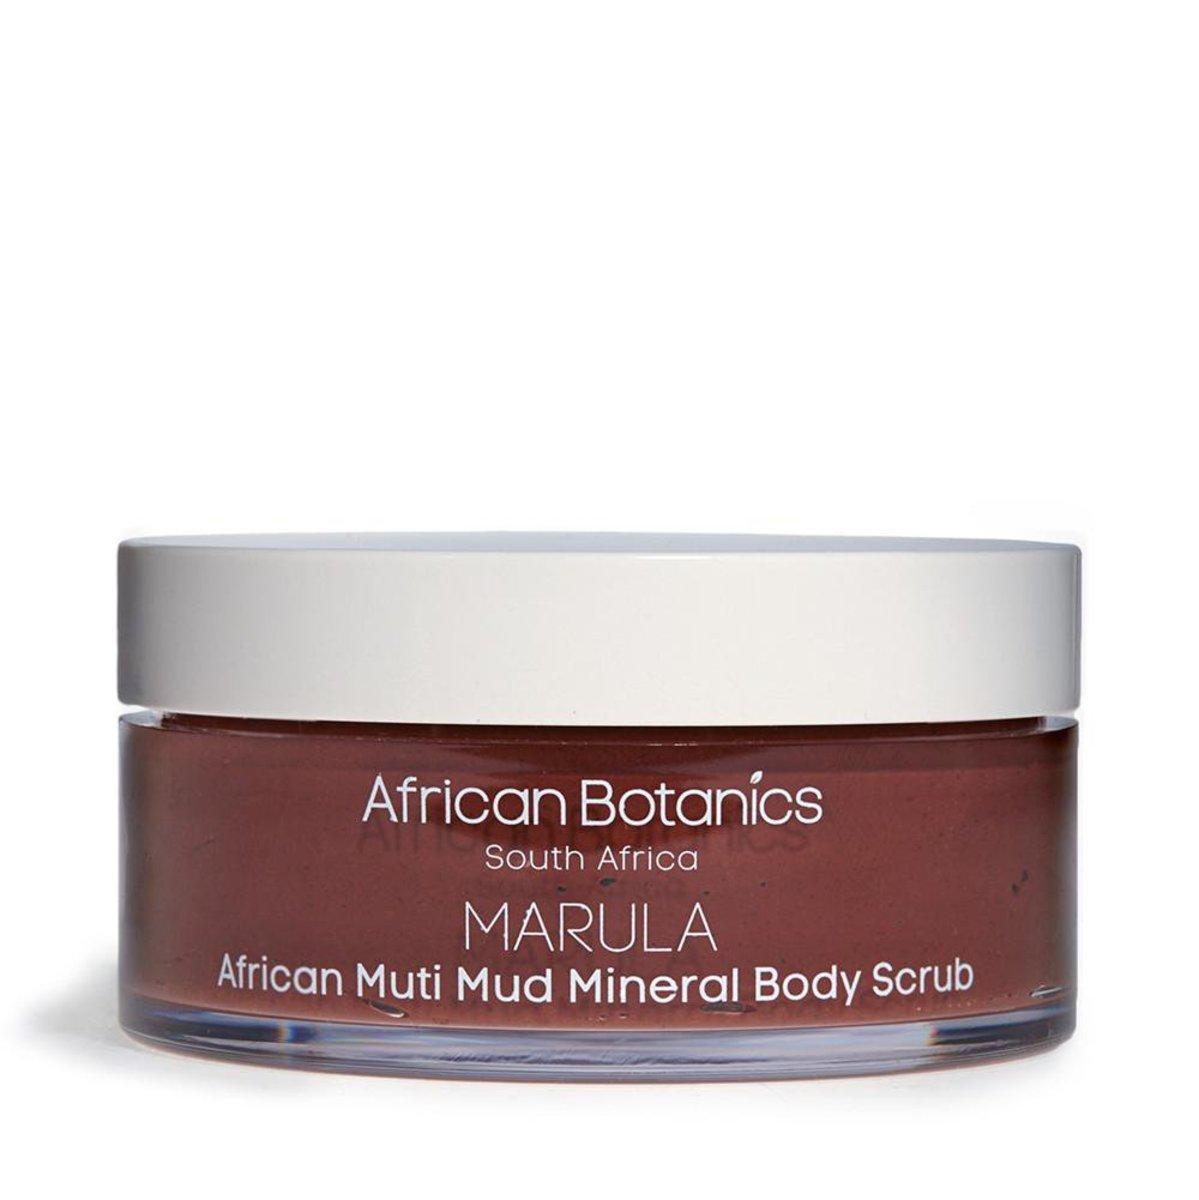 African Botanics African Mud Mineral Body Scrub